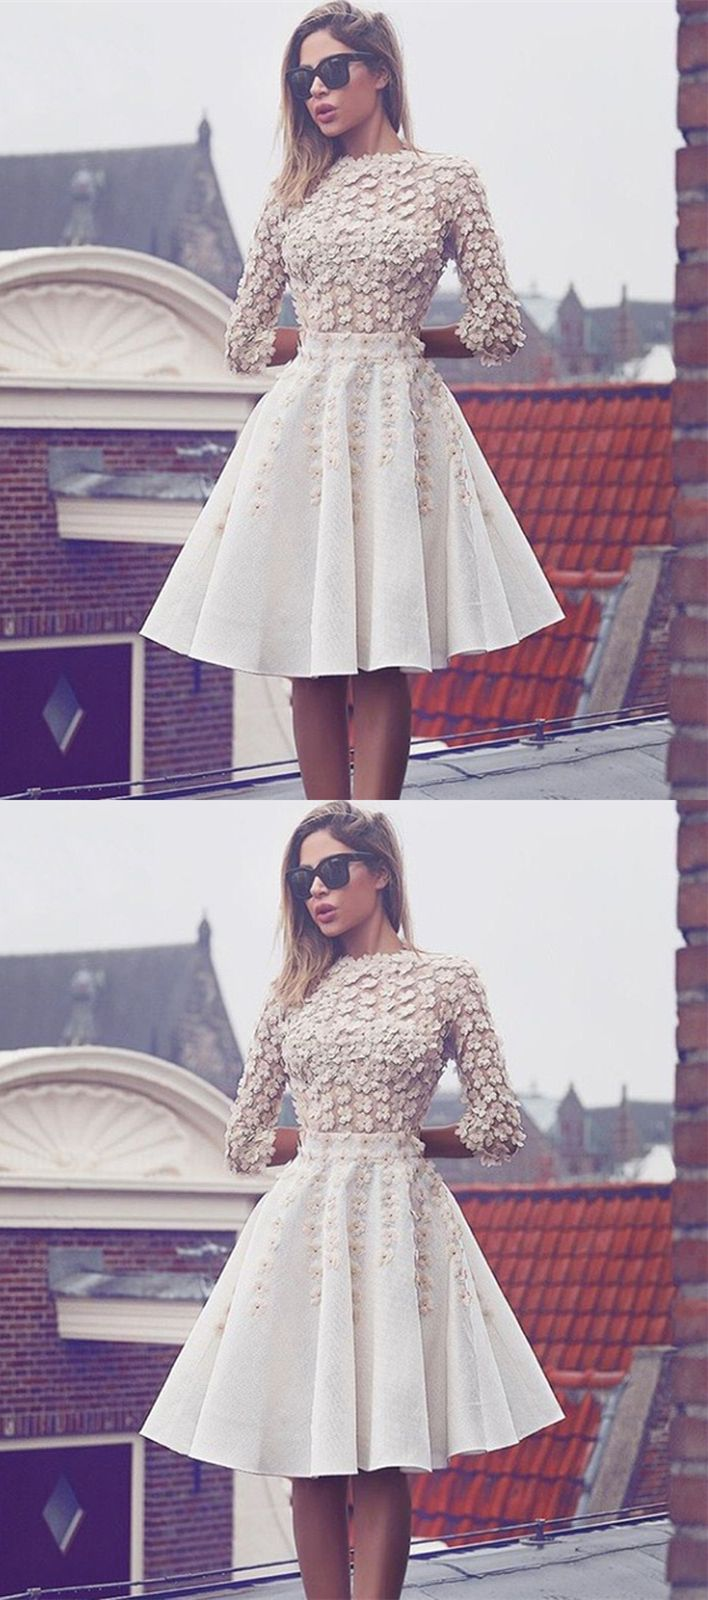 Elegant white 3/4 sleeves homecoming dresses, charming fashion dresses with appliqués, short prom dresses, semi formal dresses.